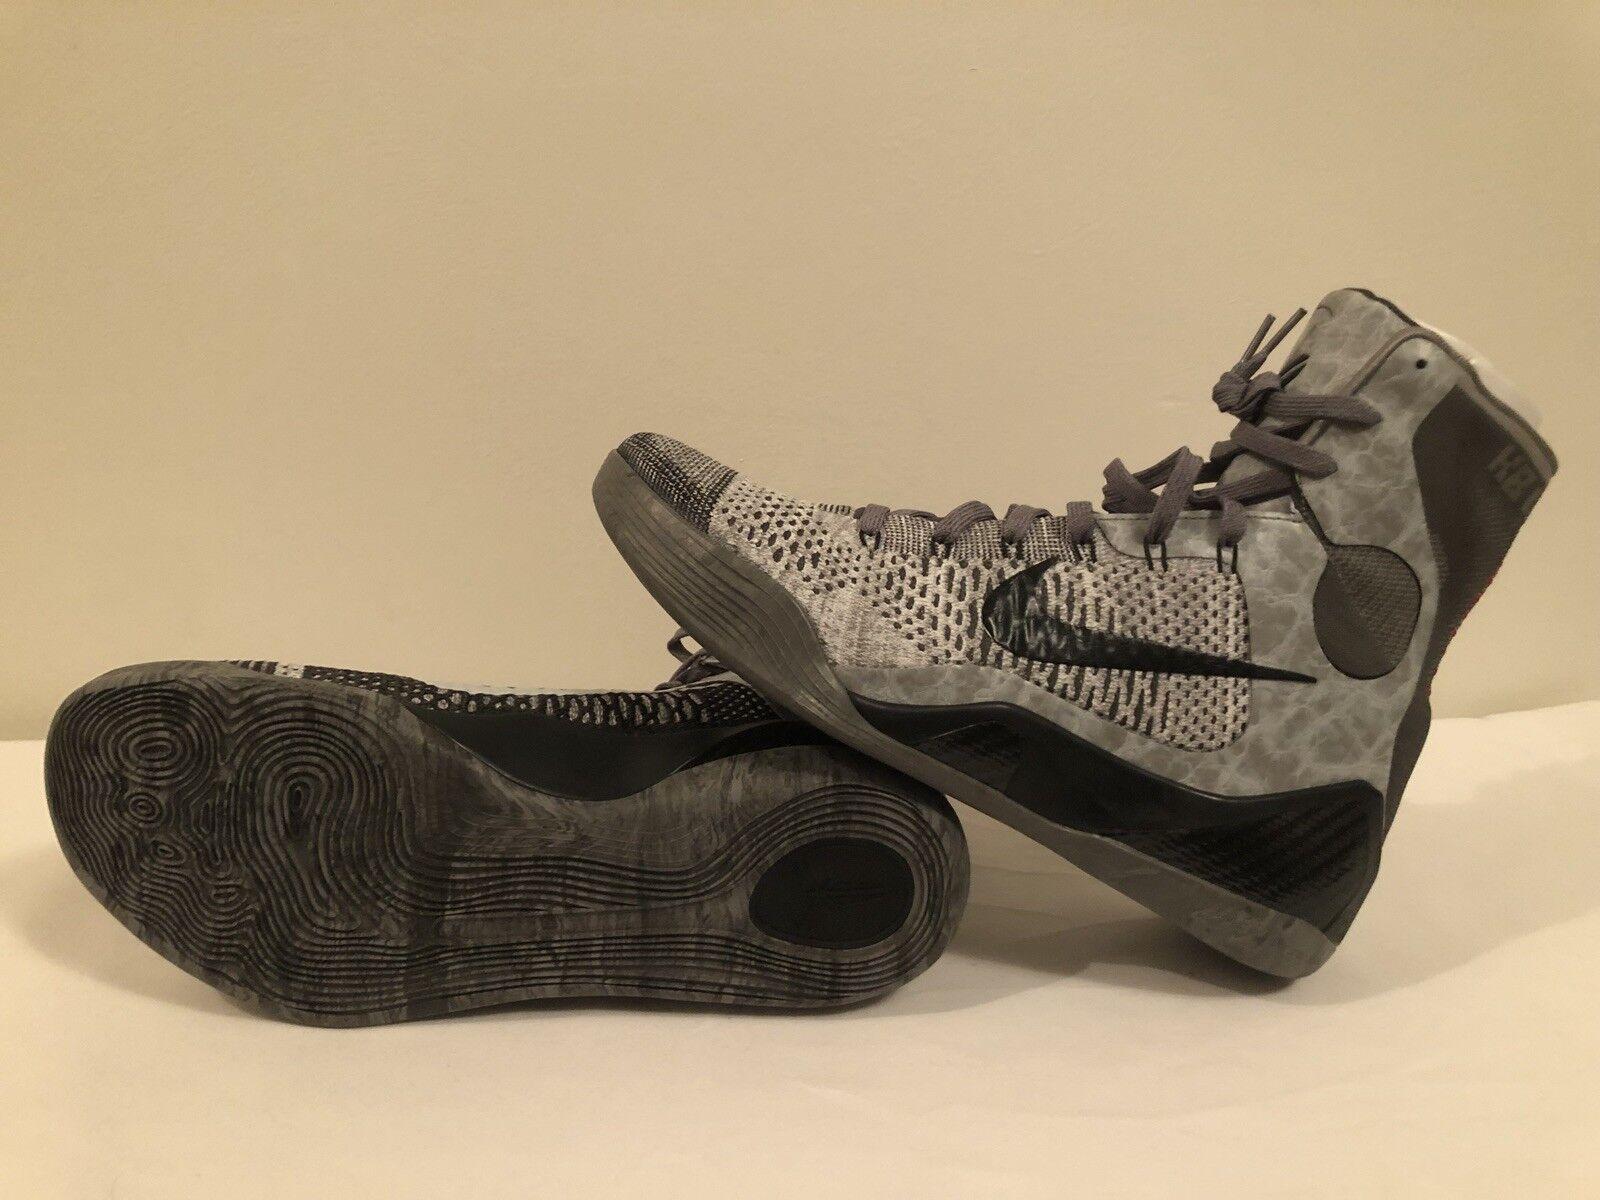 Men's Kobe 9 Elite High Dark Grey Size 13 New & Real